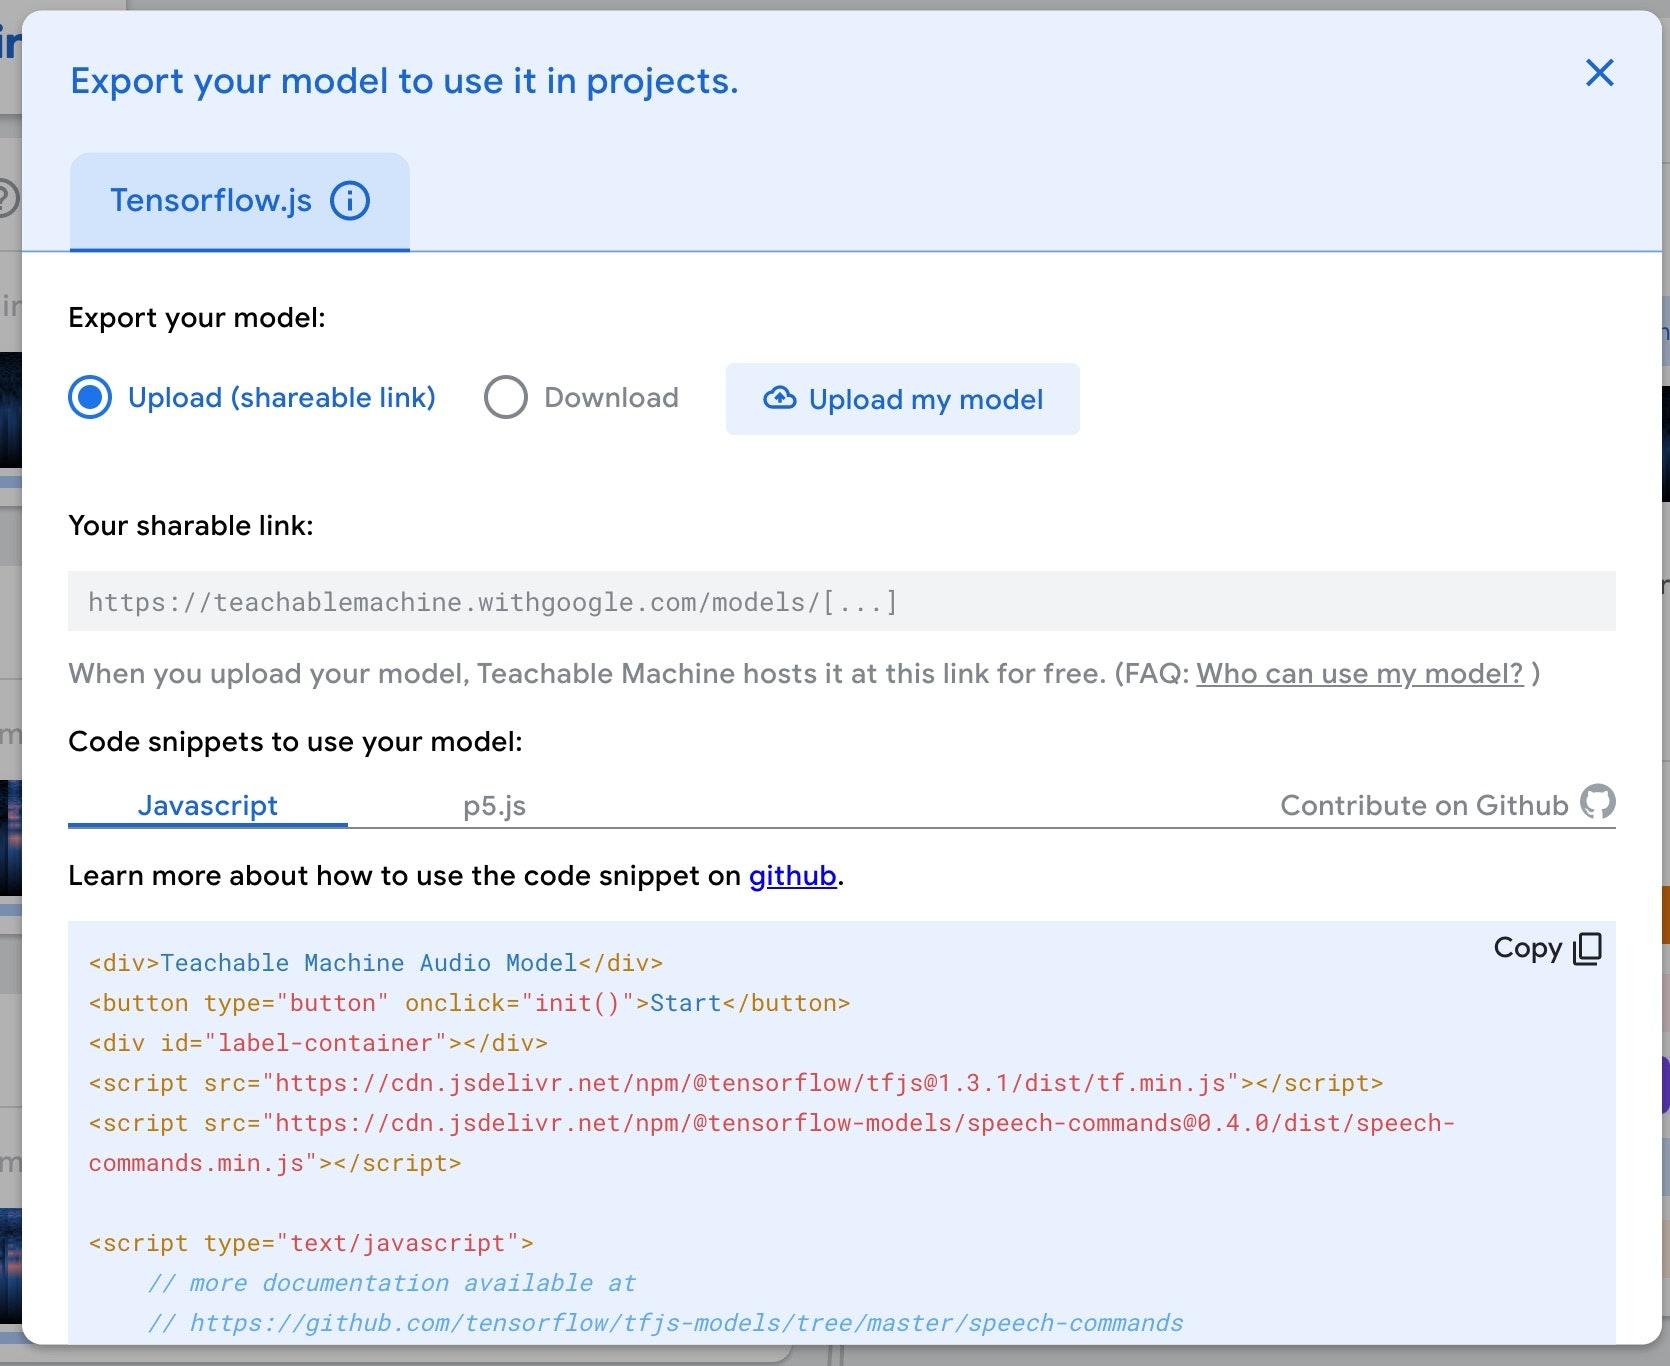 Audio_Model_-_Teachable_Machines_エクスポート2.jpg